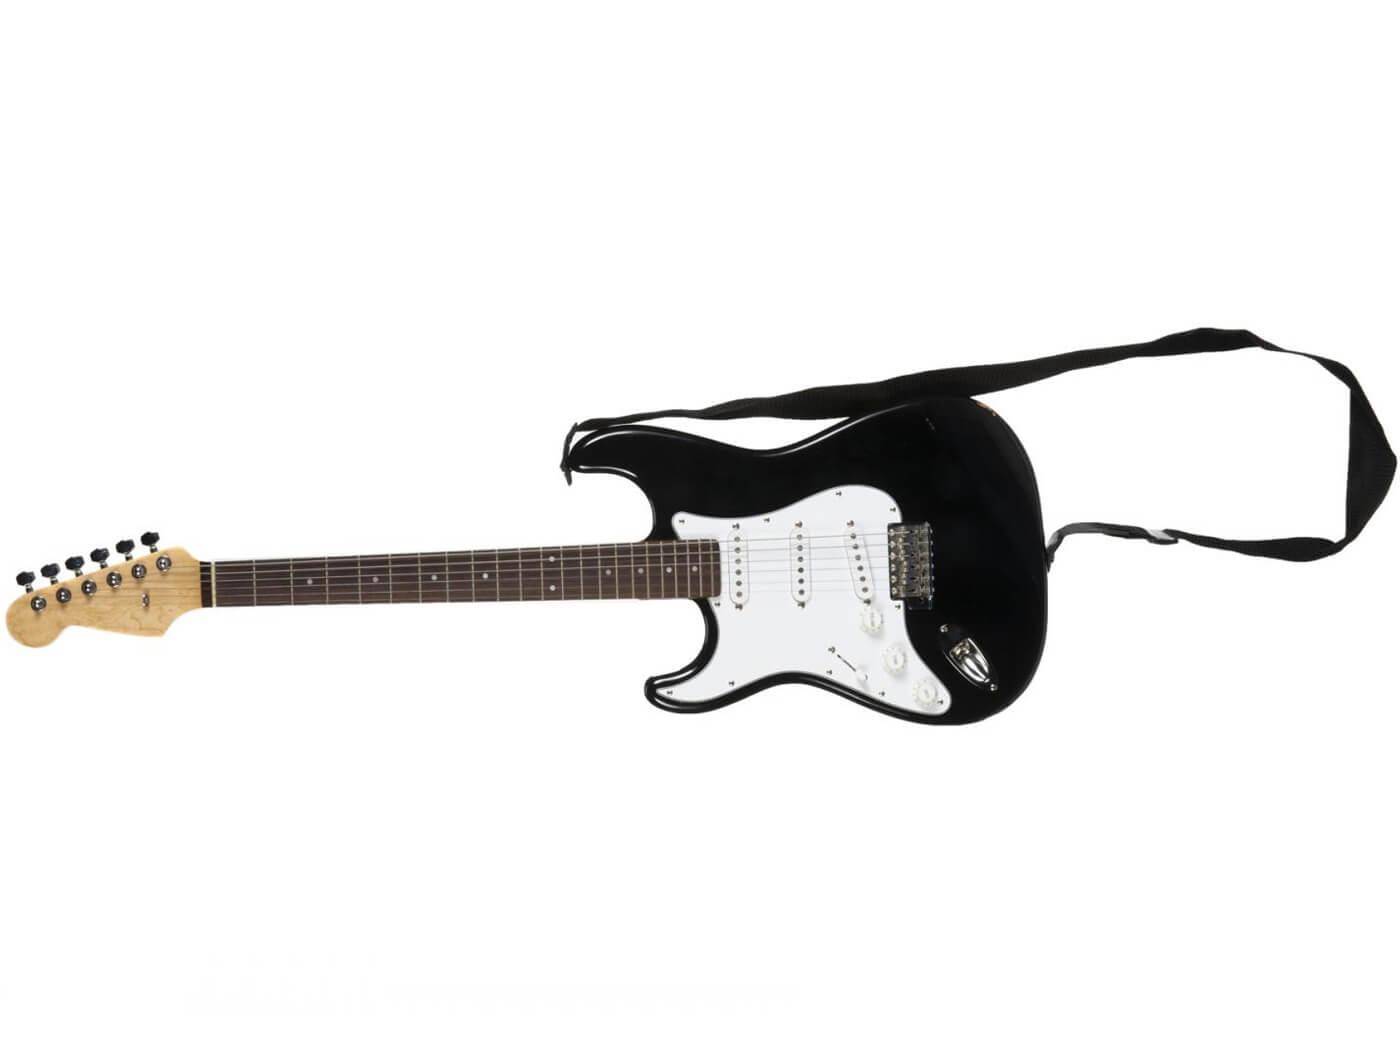 Kurt Cobain's Stratocaster